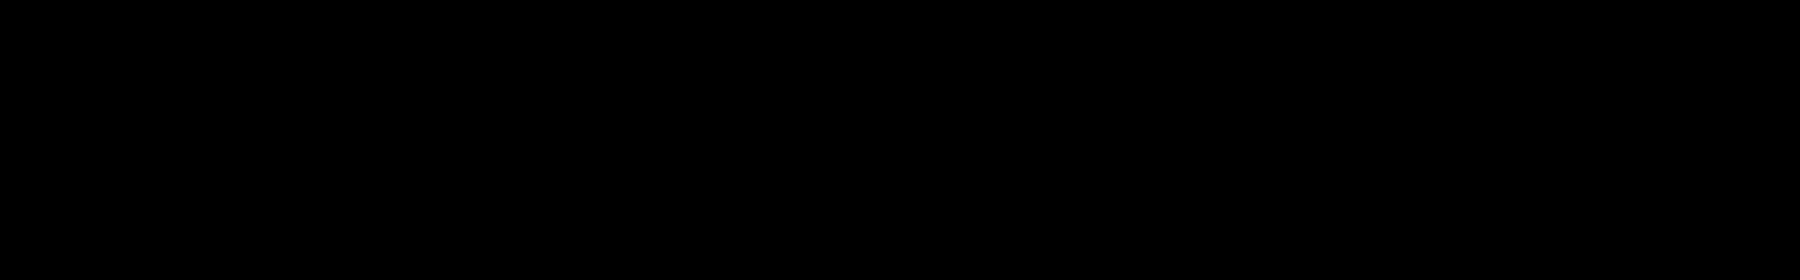 Space Coupe audio waveform